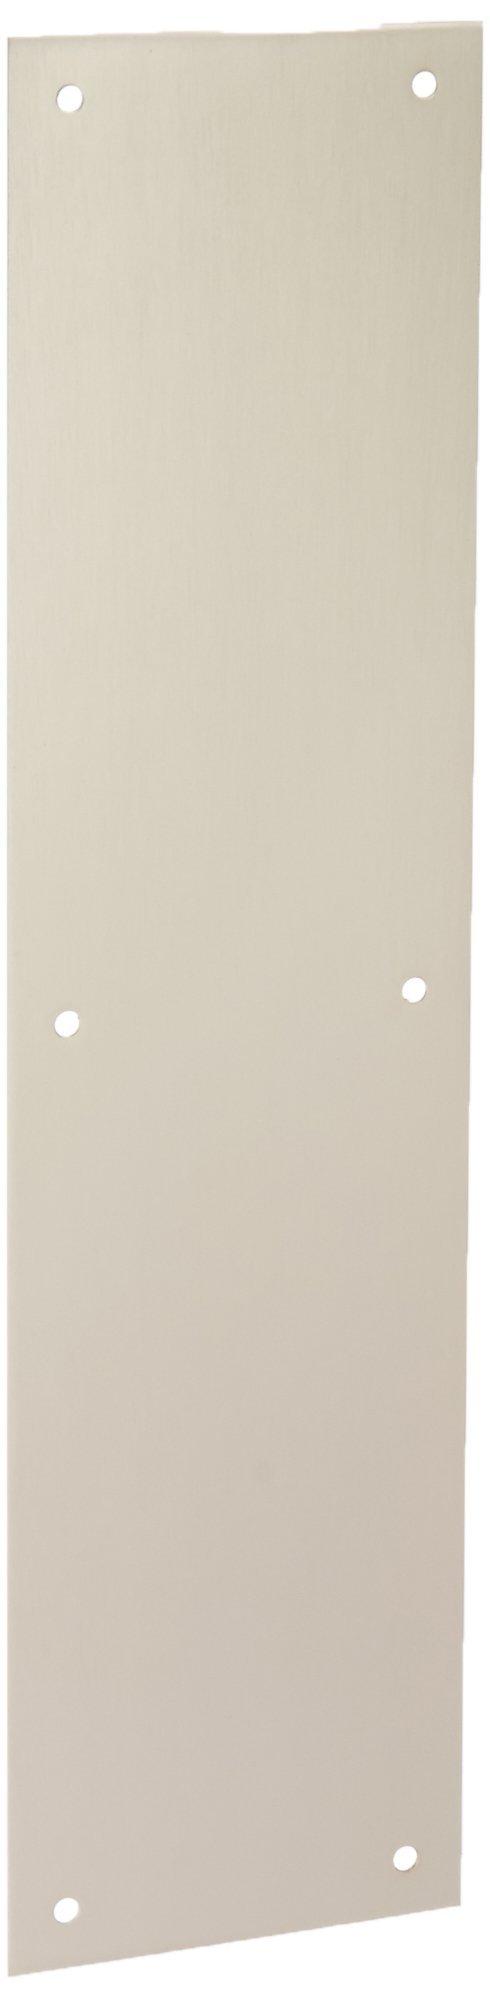 Baldwin 2124 4 Inch x 16 Inch Solid Brass Square Edge Push Plate, Satin Nickel by Baldwin